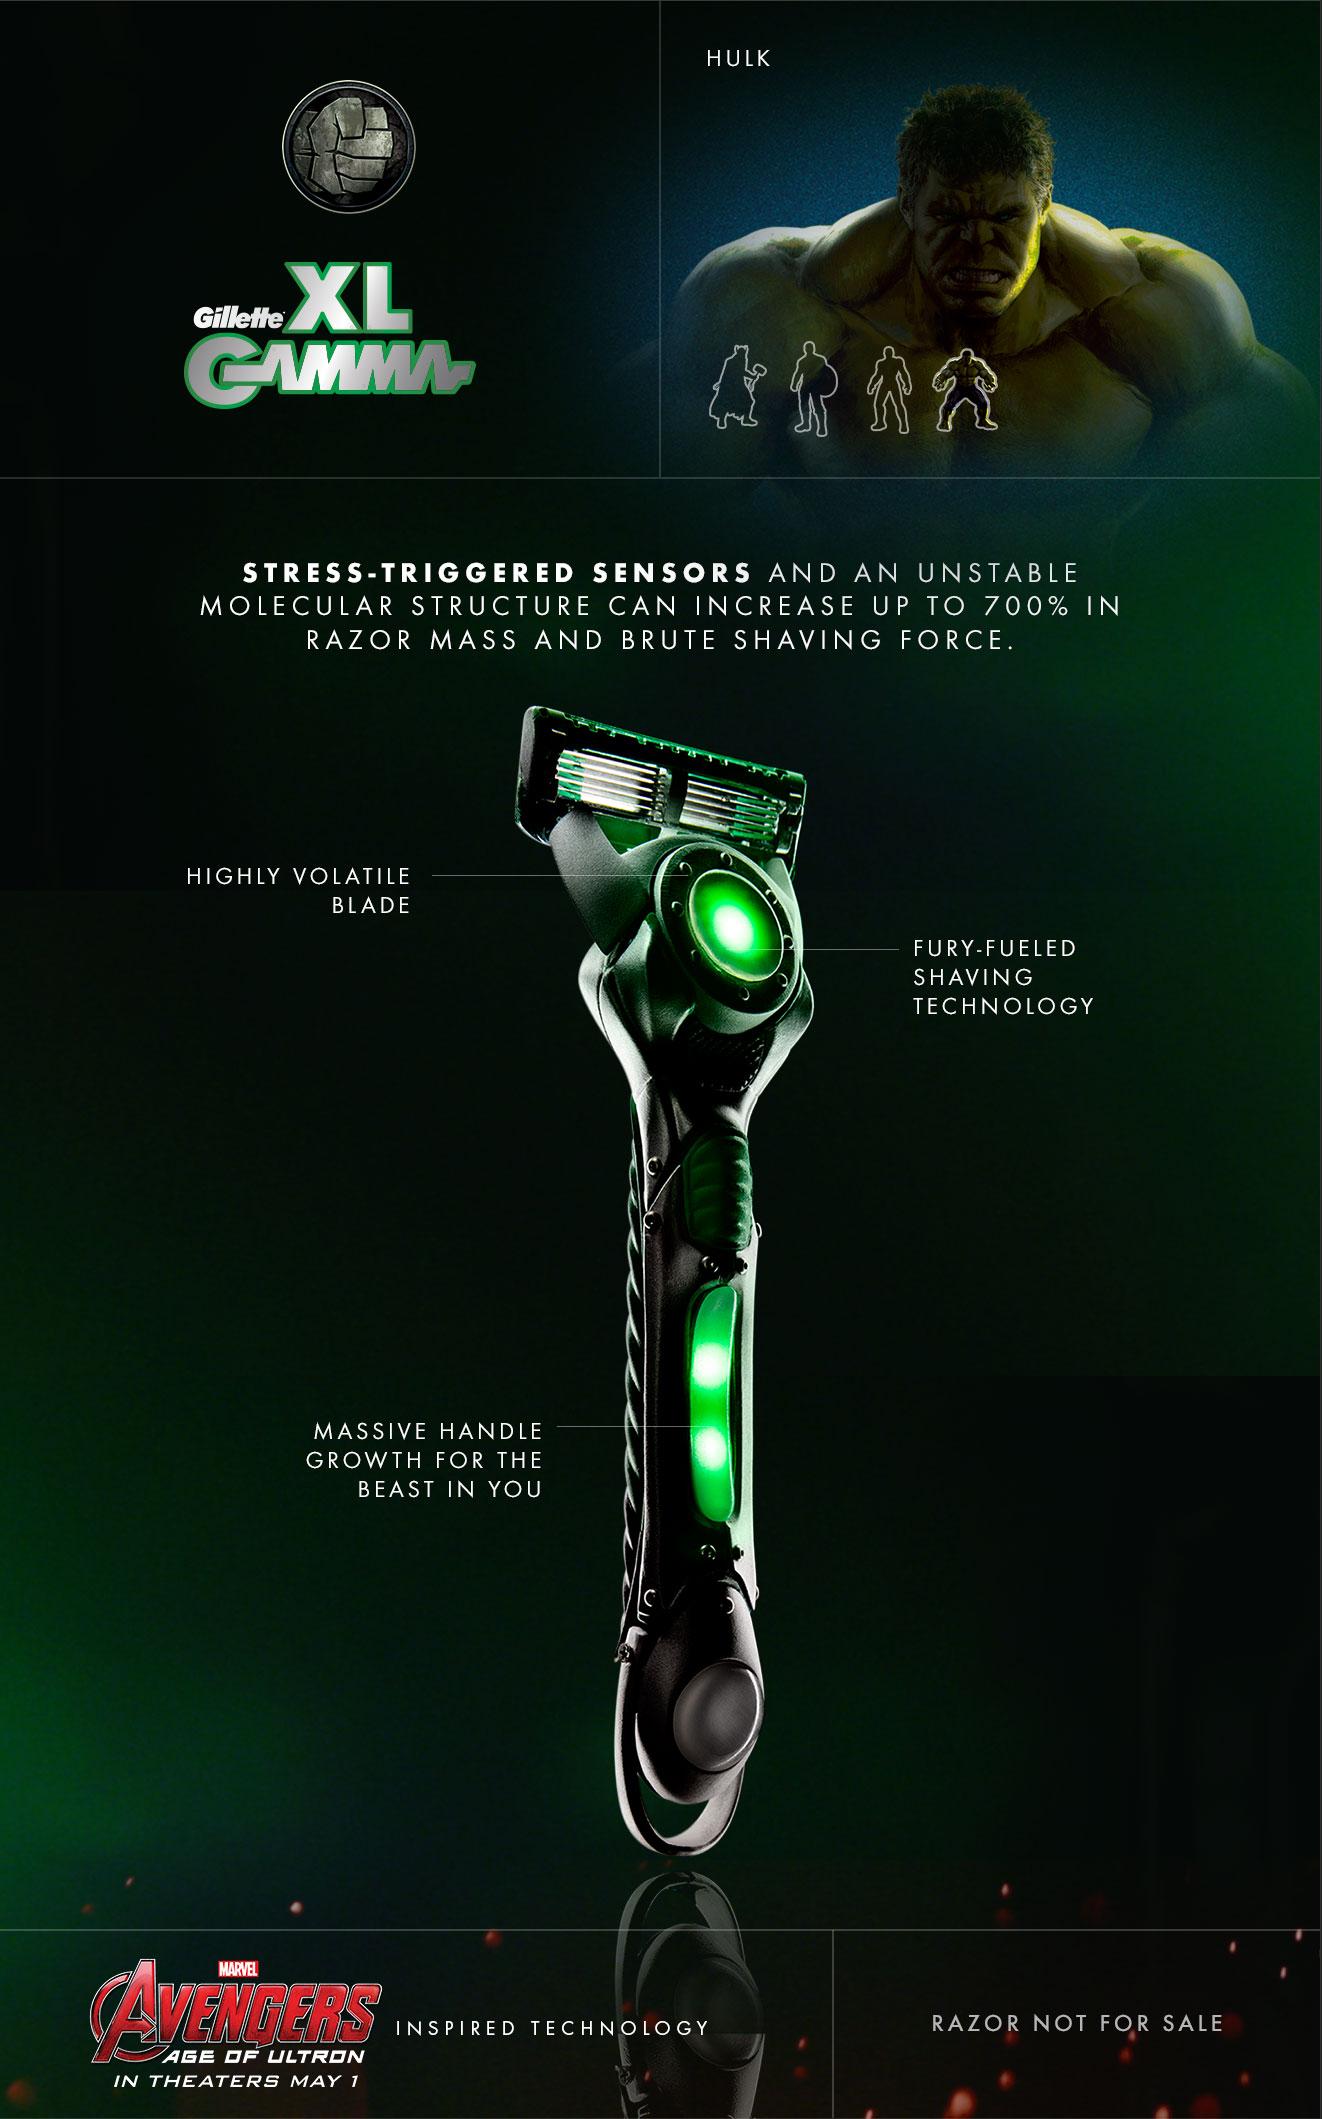 gillette_xl_gamma_razor_hulk